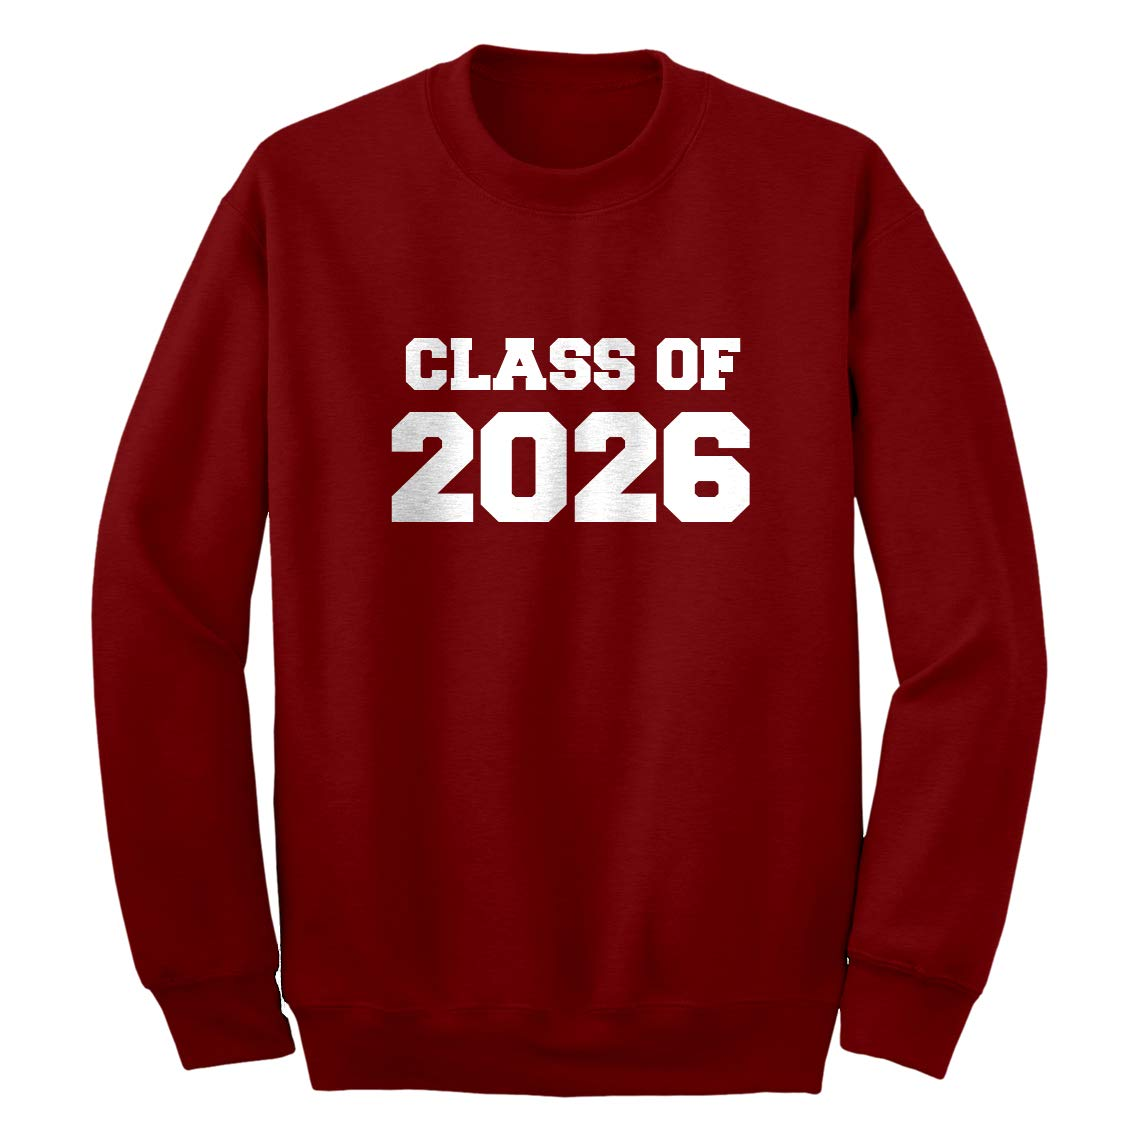 Indica Plateau Class of 2026 Unisex Adult Sweatshirt